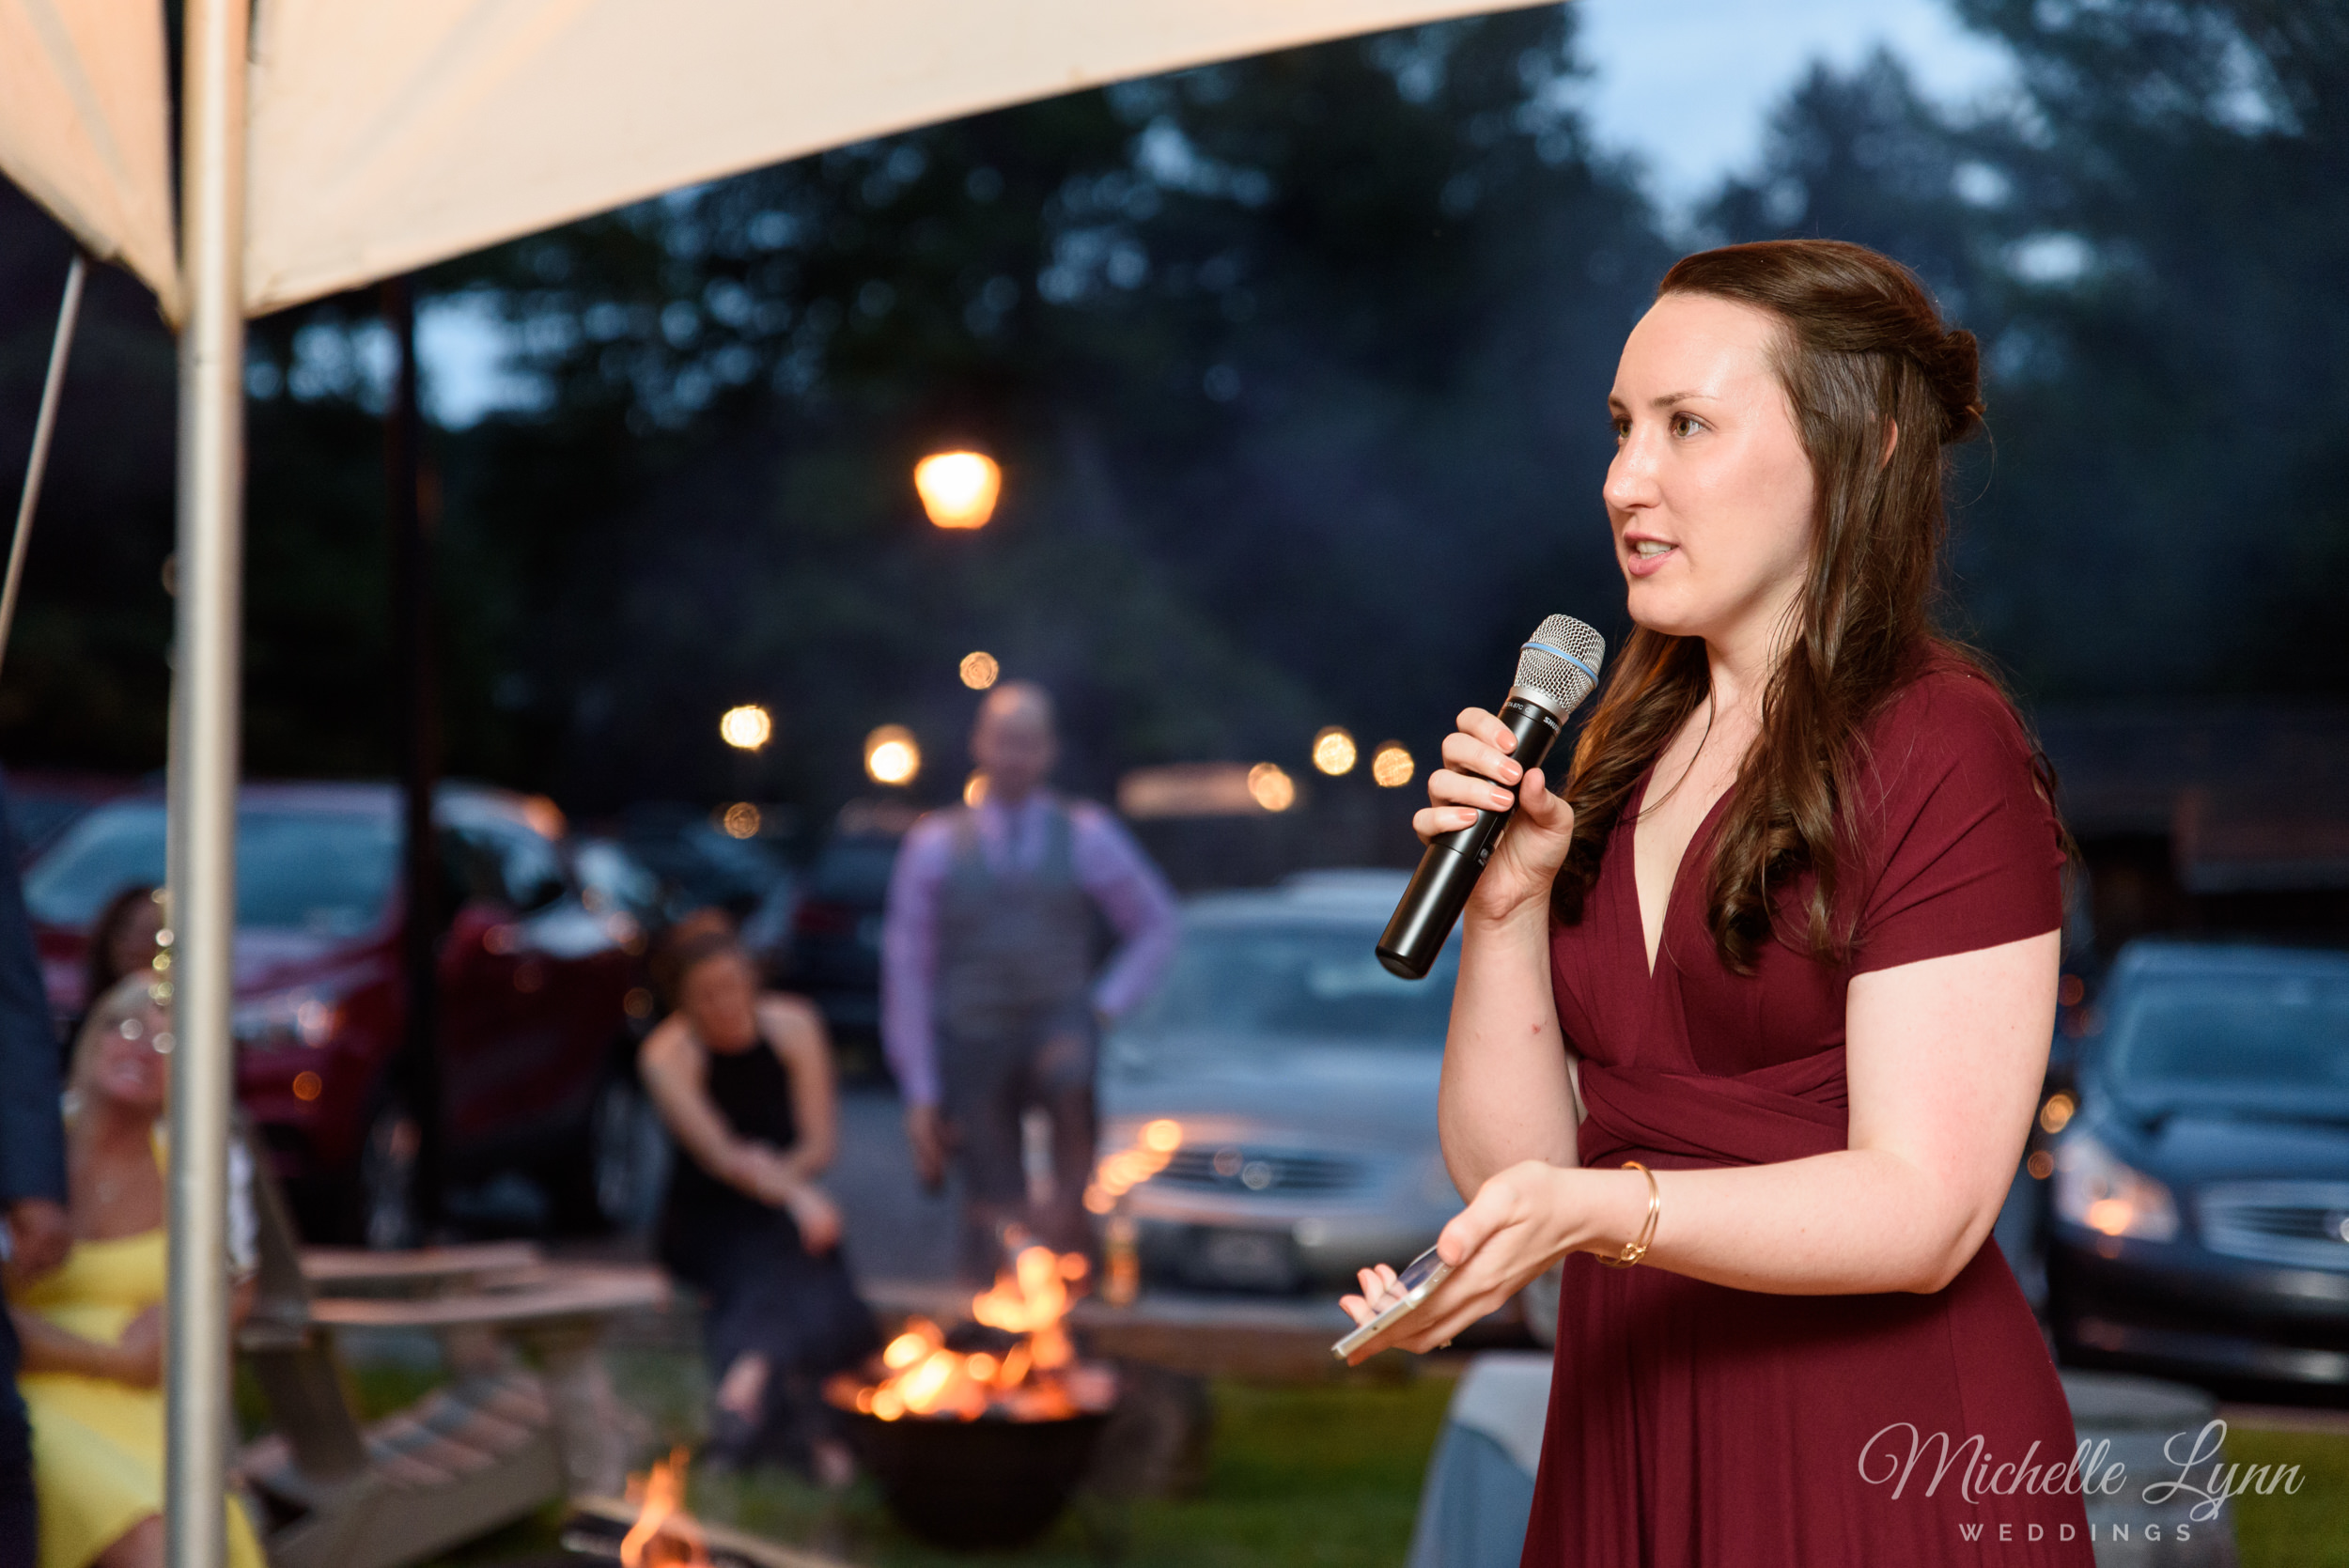 mlw-lumberville-general-store-new-hope-wedding-photographer-62.jpg